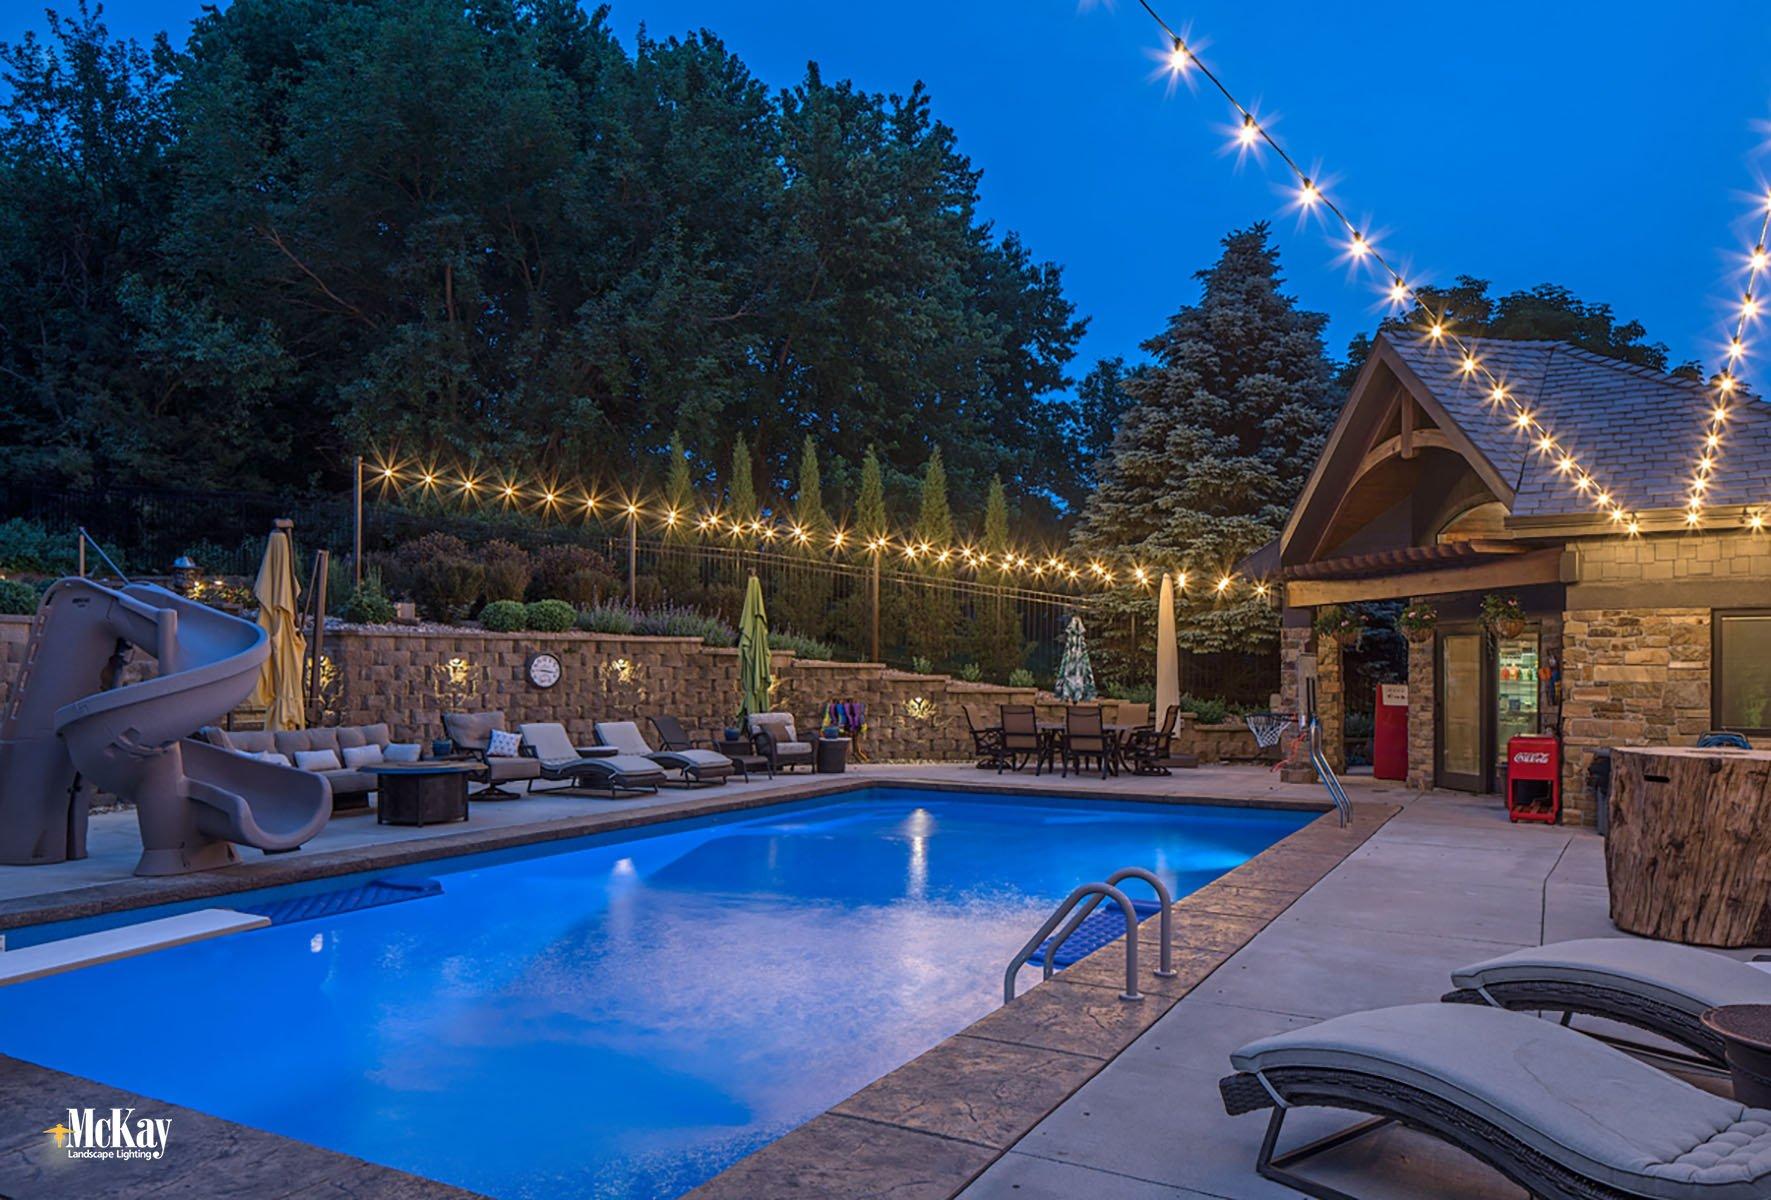 Outdoor Pool Lighting Omaha Nebraska McKay Landscape Lighting B 02